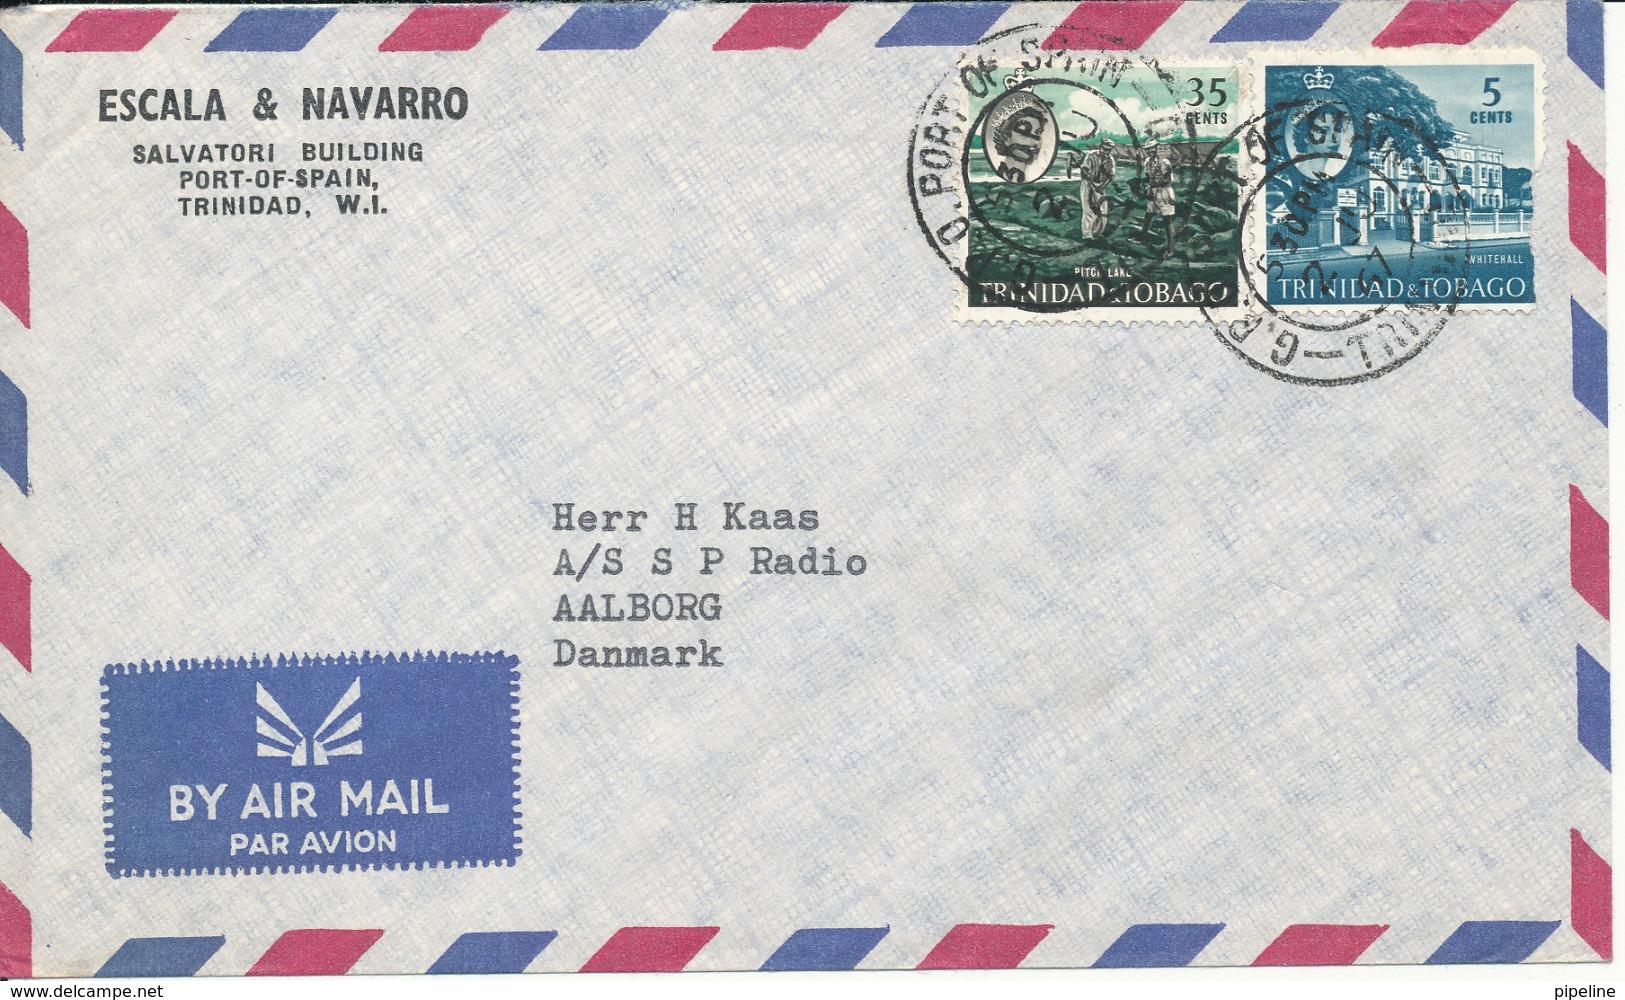 Trinidad & Tobago Air Mail Cover Sent To Denmark 2-6-1967 (1 Of The Stamps Damaged) - Trinidad & Tobago (1962-...)